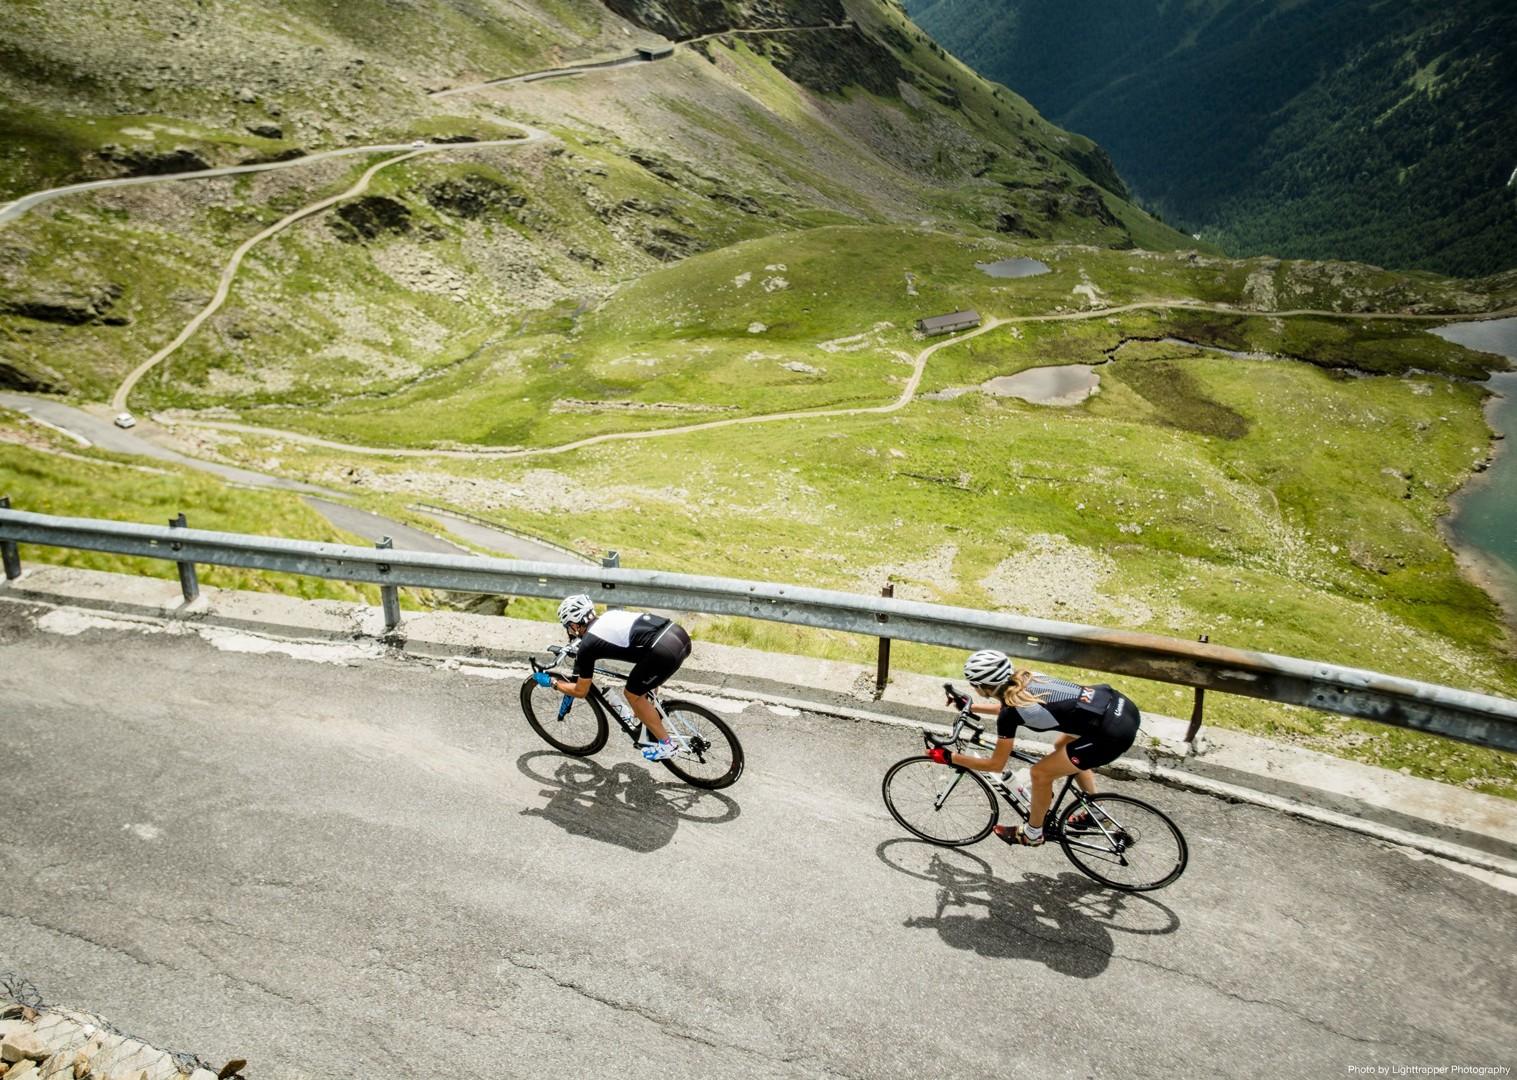 mortirolo-guided-road-cycling-holiday.jpg - Italy - Italian Alps Introduction - Guided Road Cycling Holiday - Road Cycling